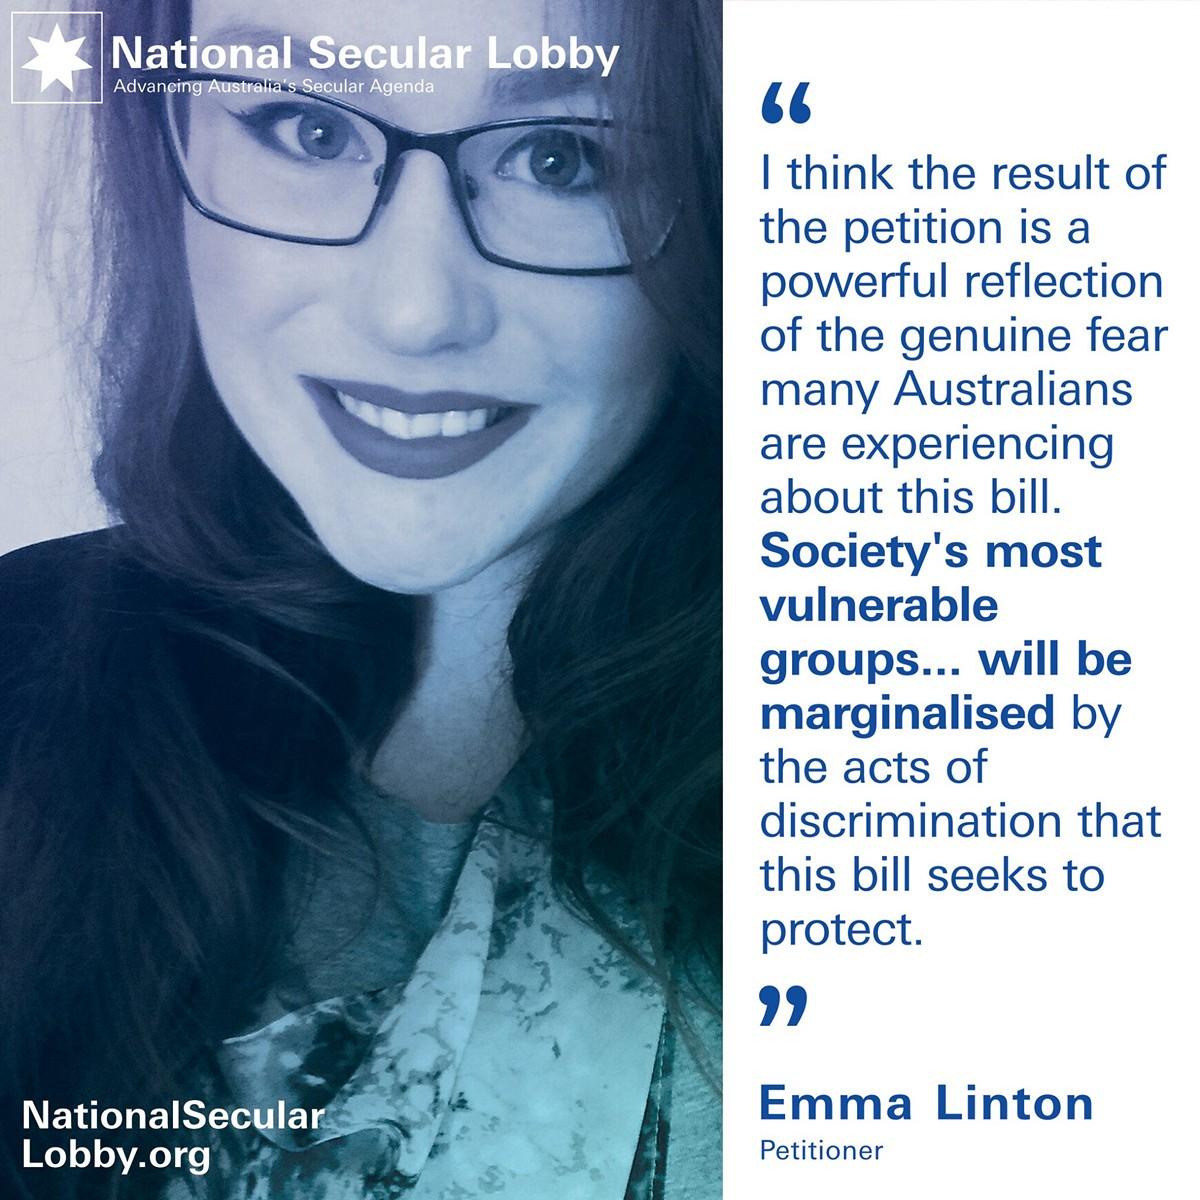 Emma Linton's RDB Petition